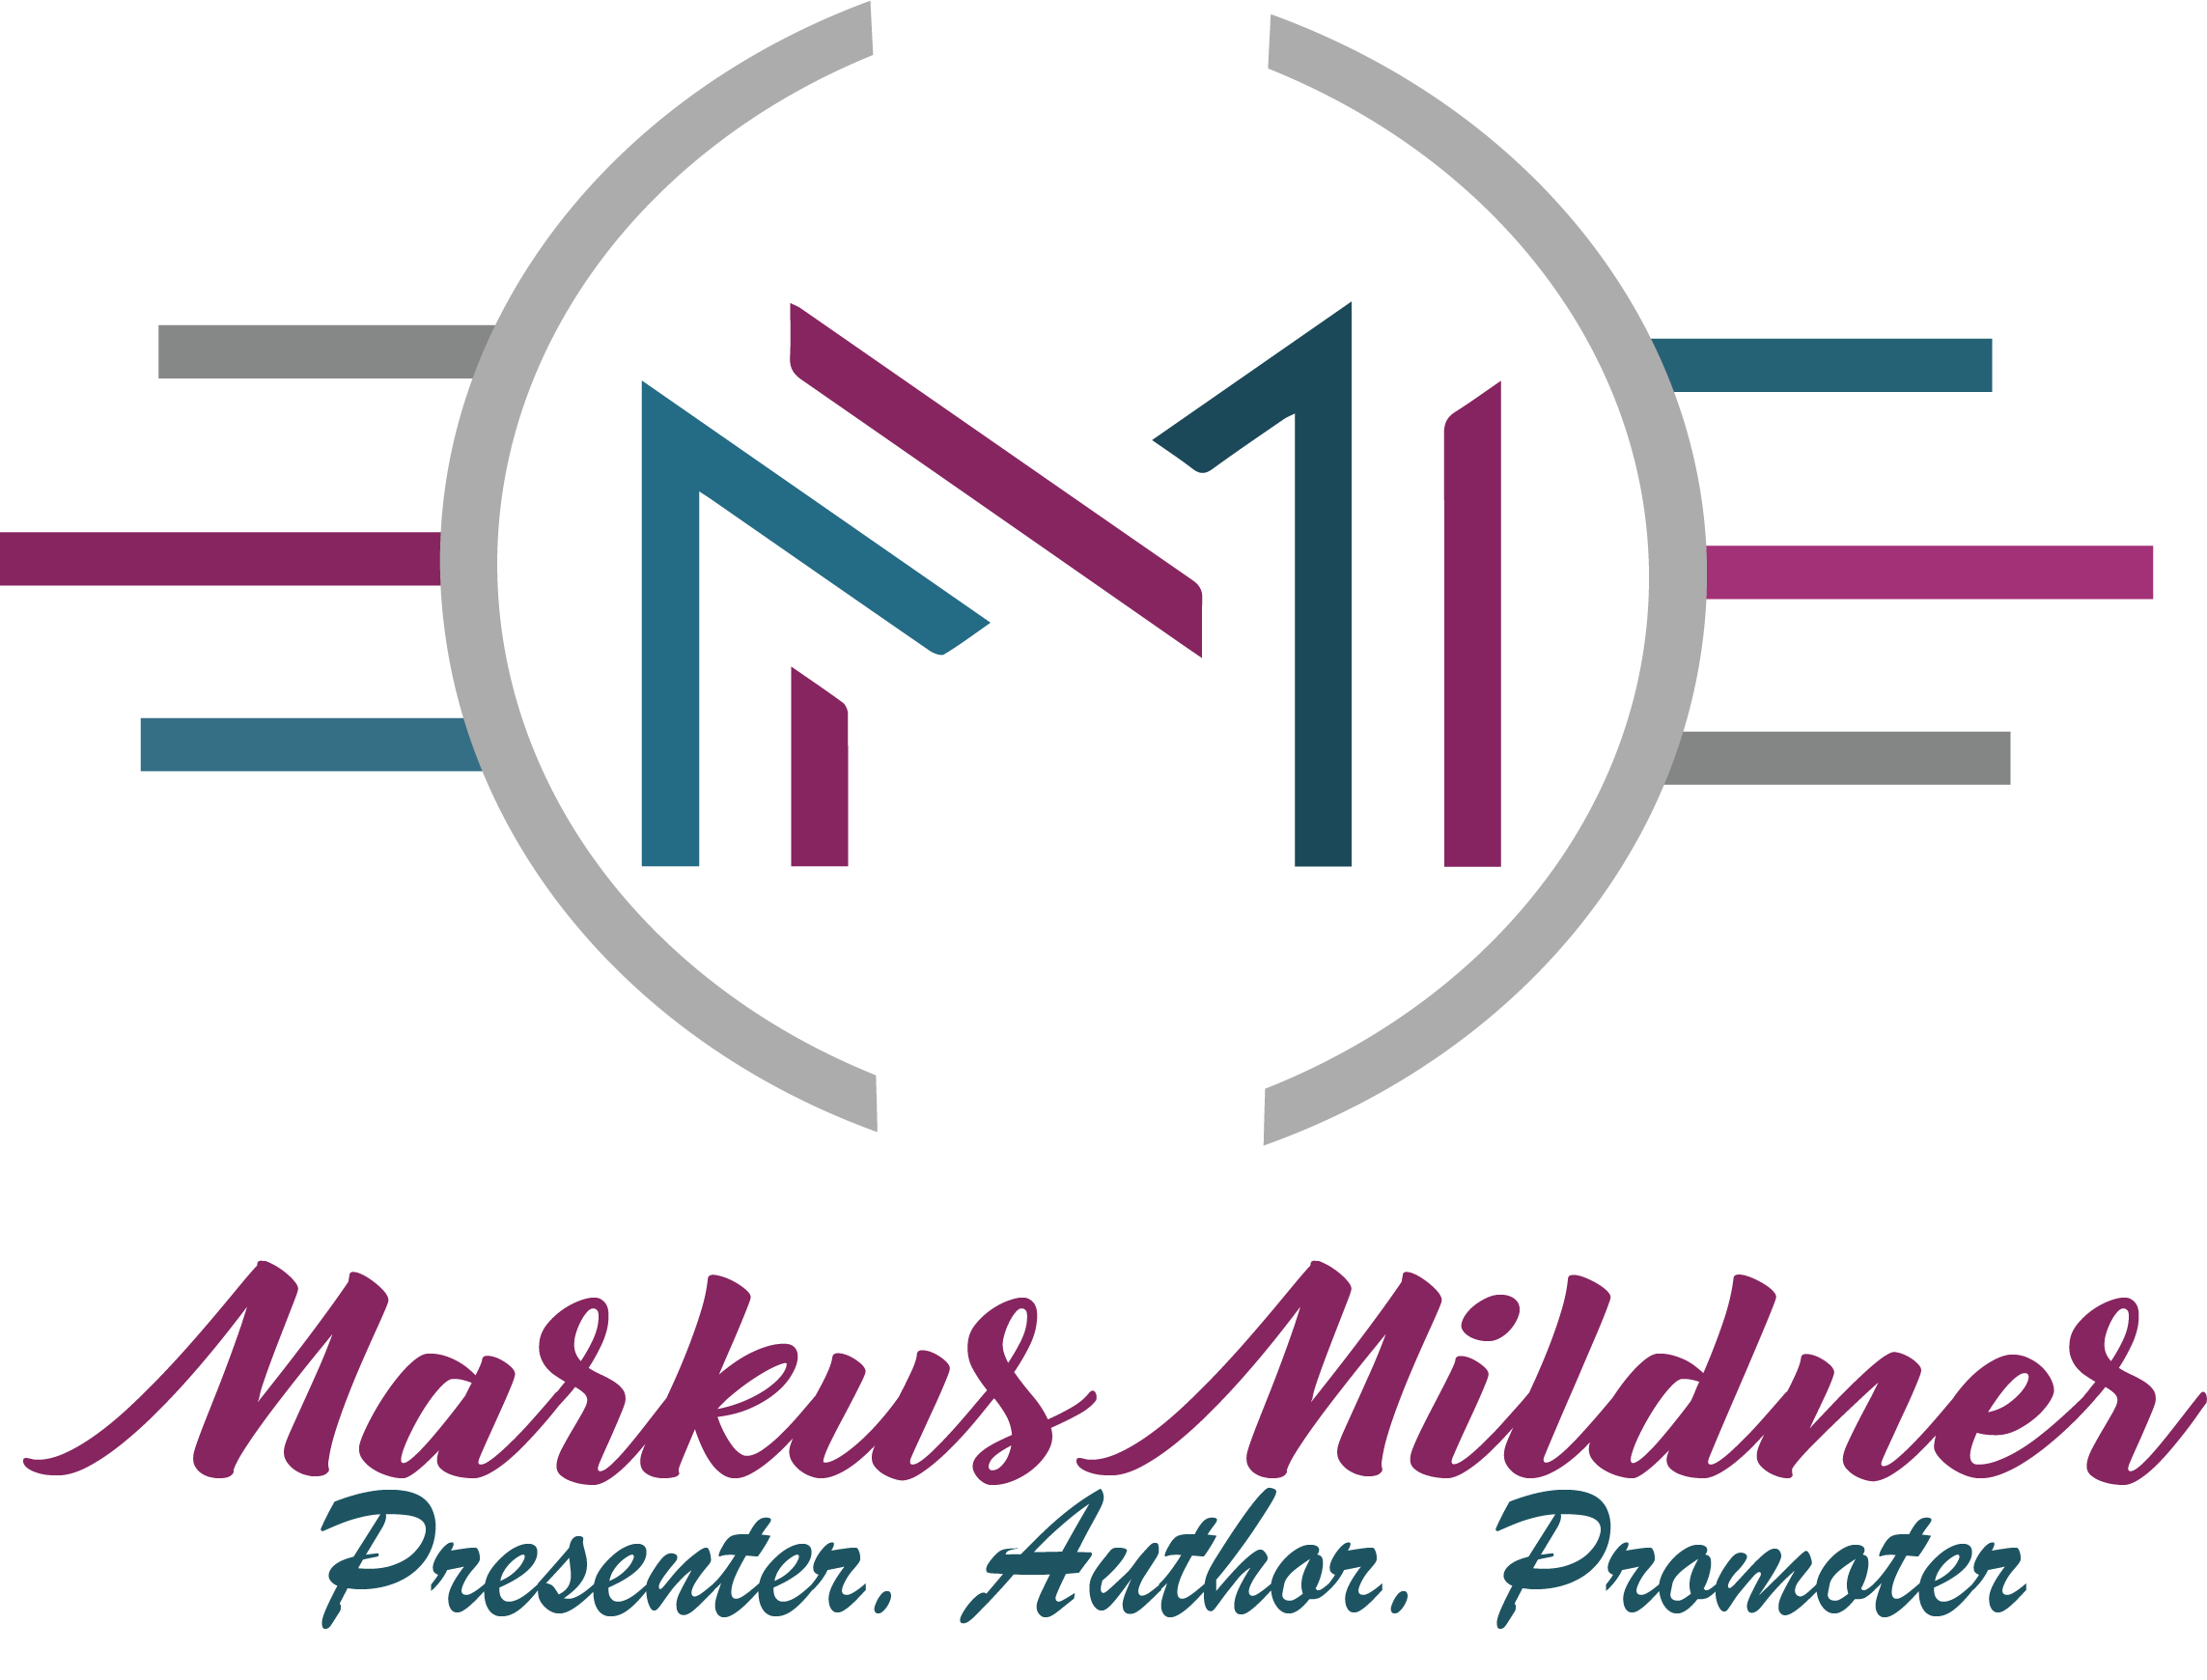 Markus Mildner